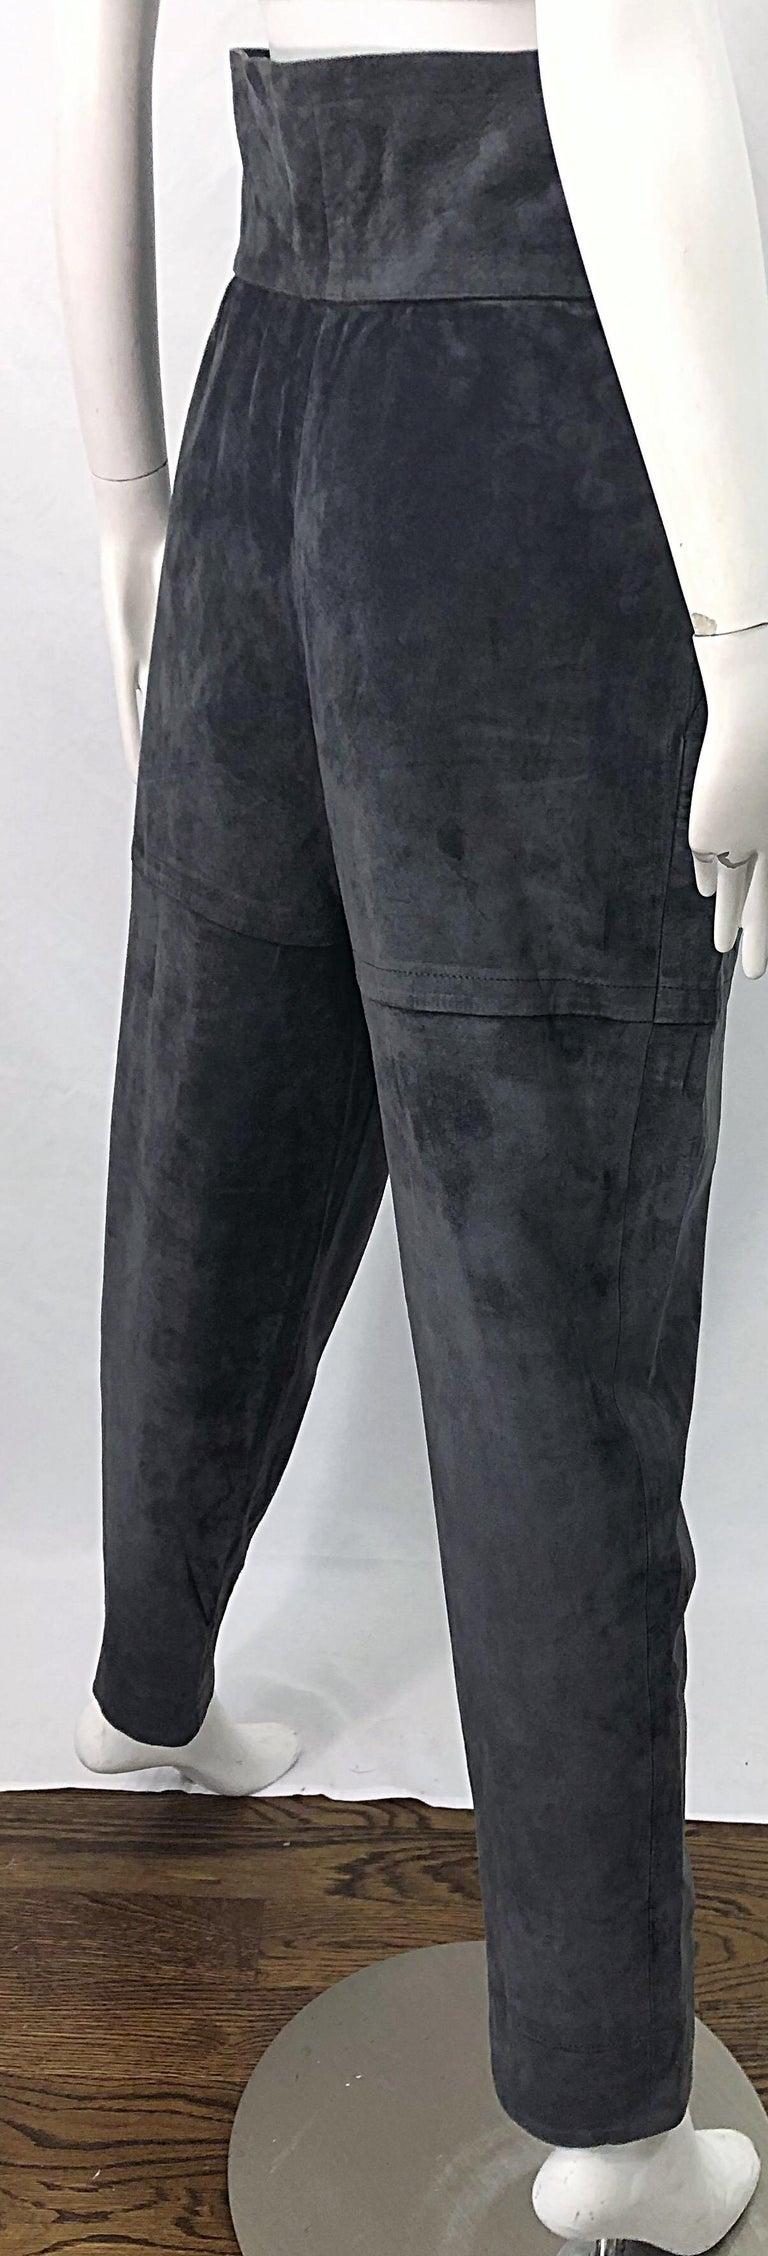 Vintage Yves Saint Laurent YSL 1980s Grey Suede Leather High Waisted Harem Pants For Sale 5